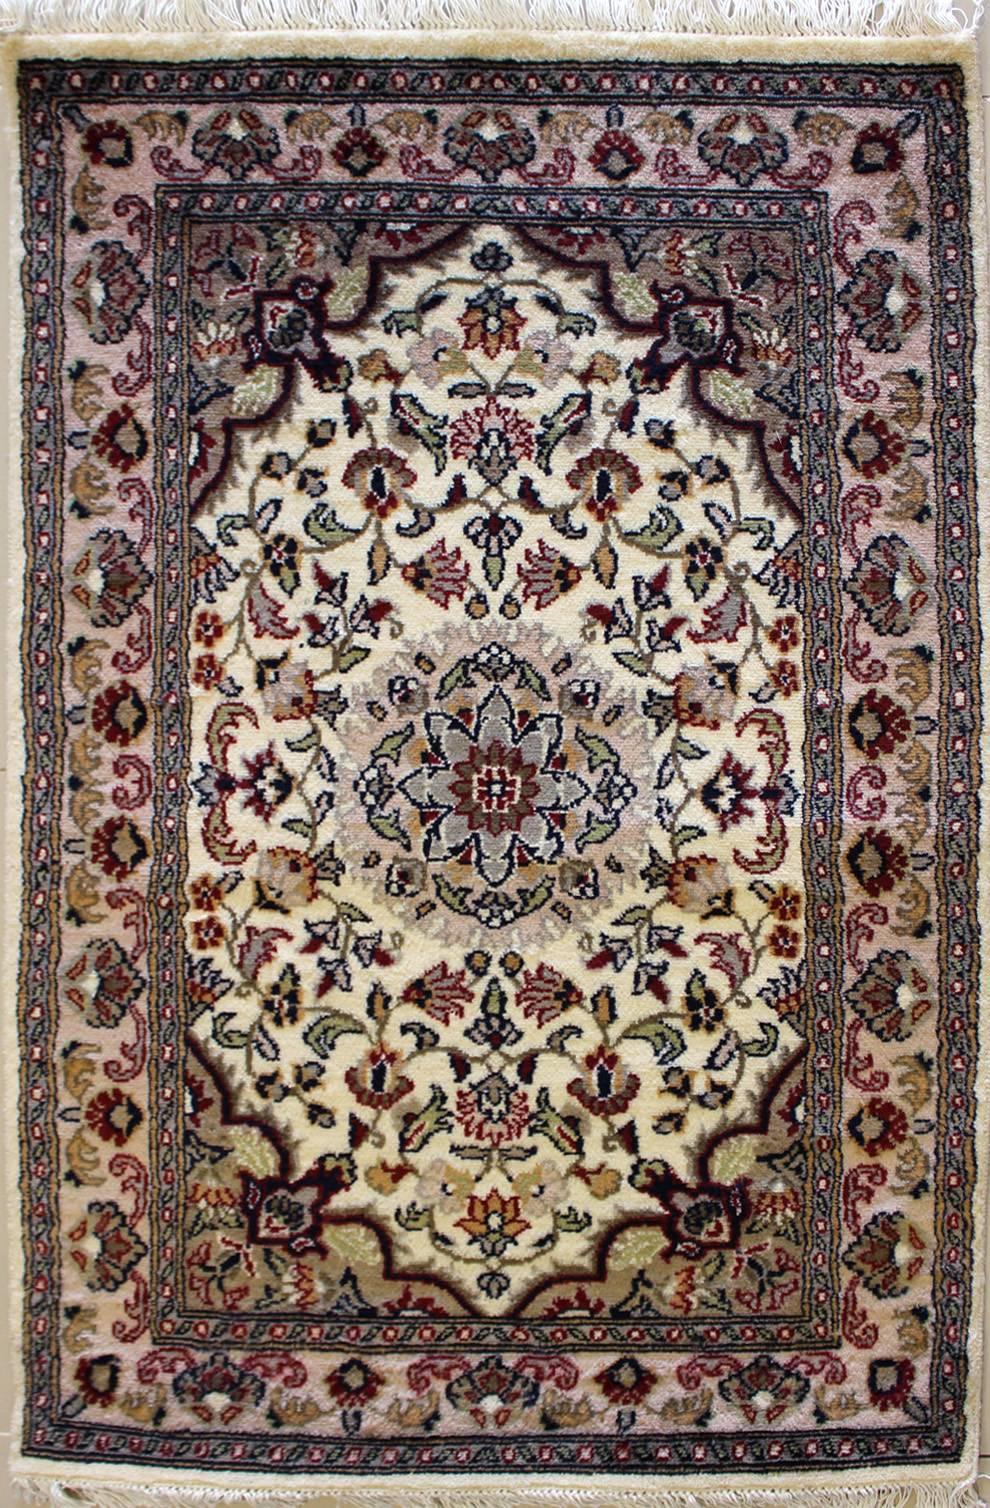 2 6x4 Rug Fl Handmade Pak Persian High Quality Rugs A 2x4 Size Rugstc